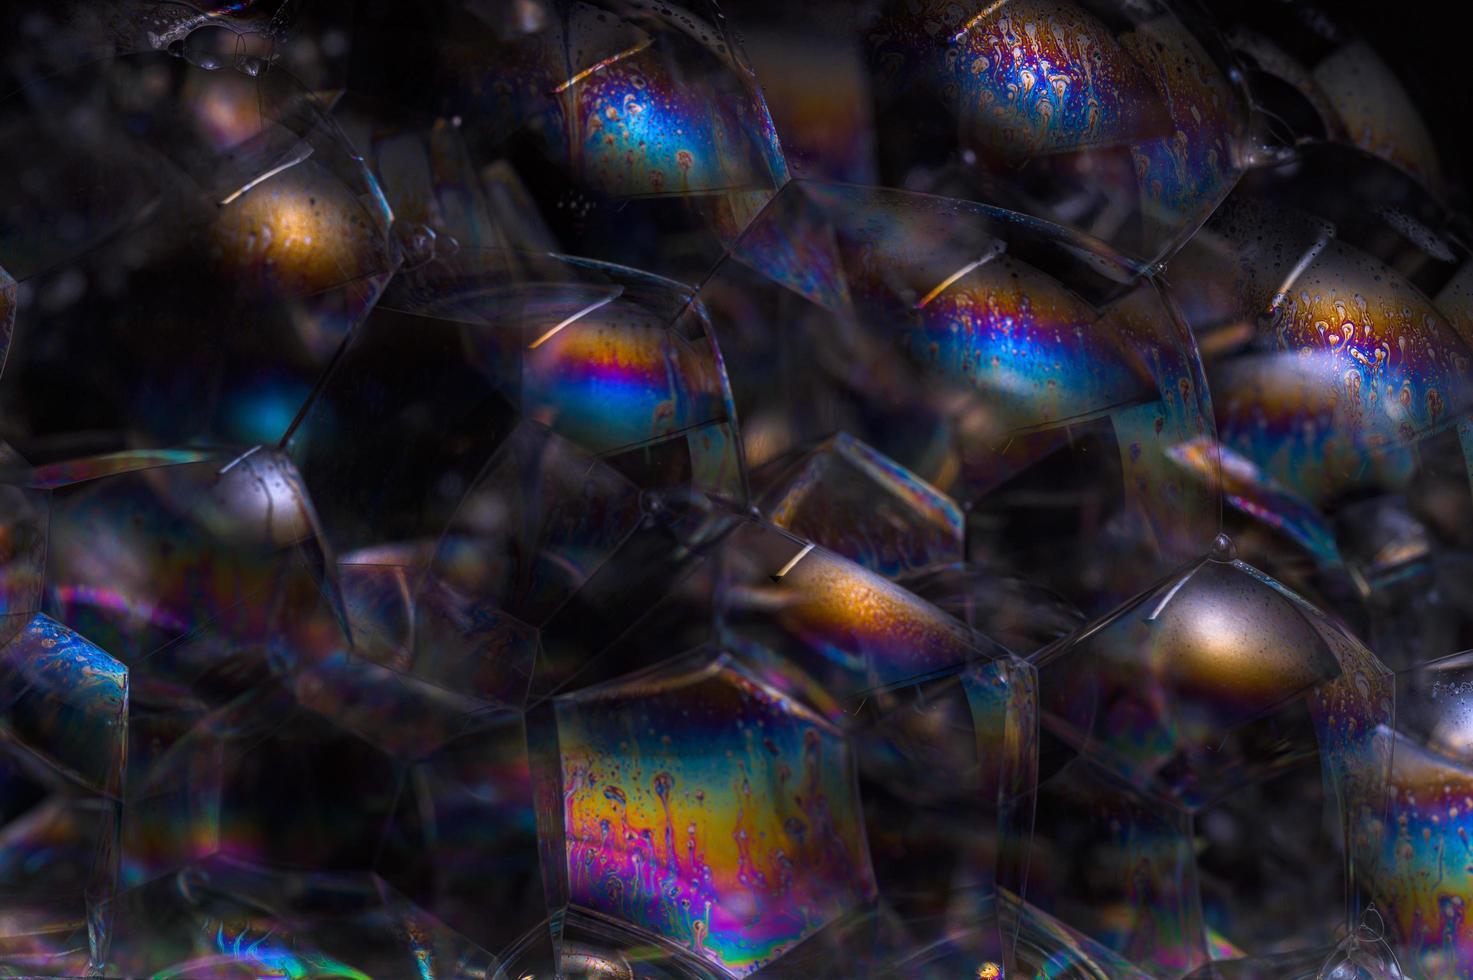 burbujas sobre fondo negro foto